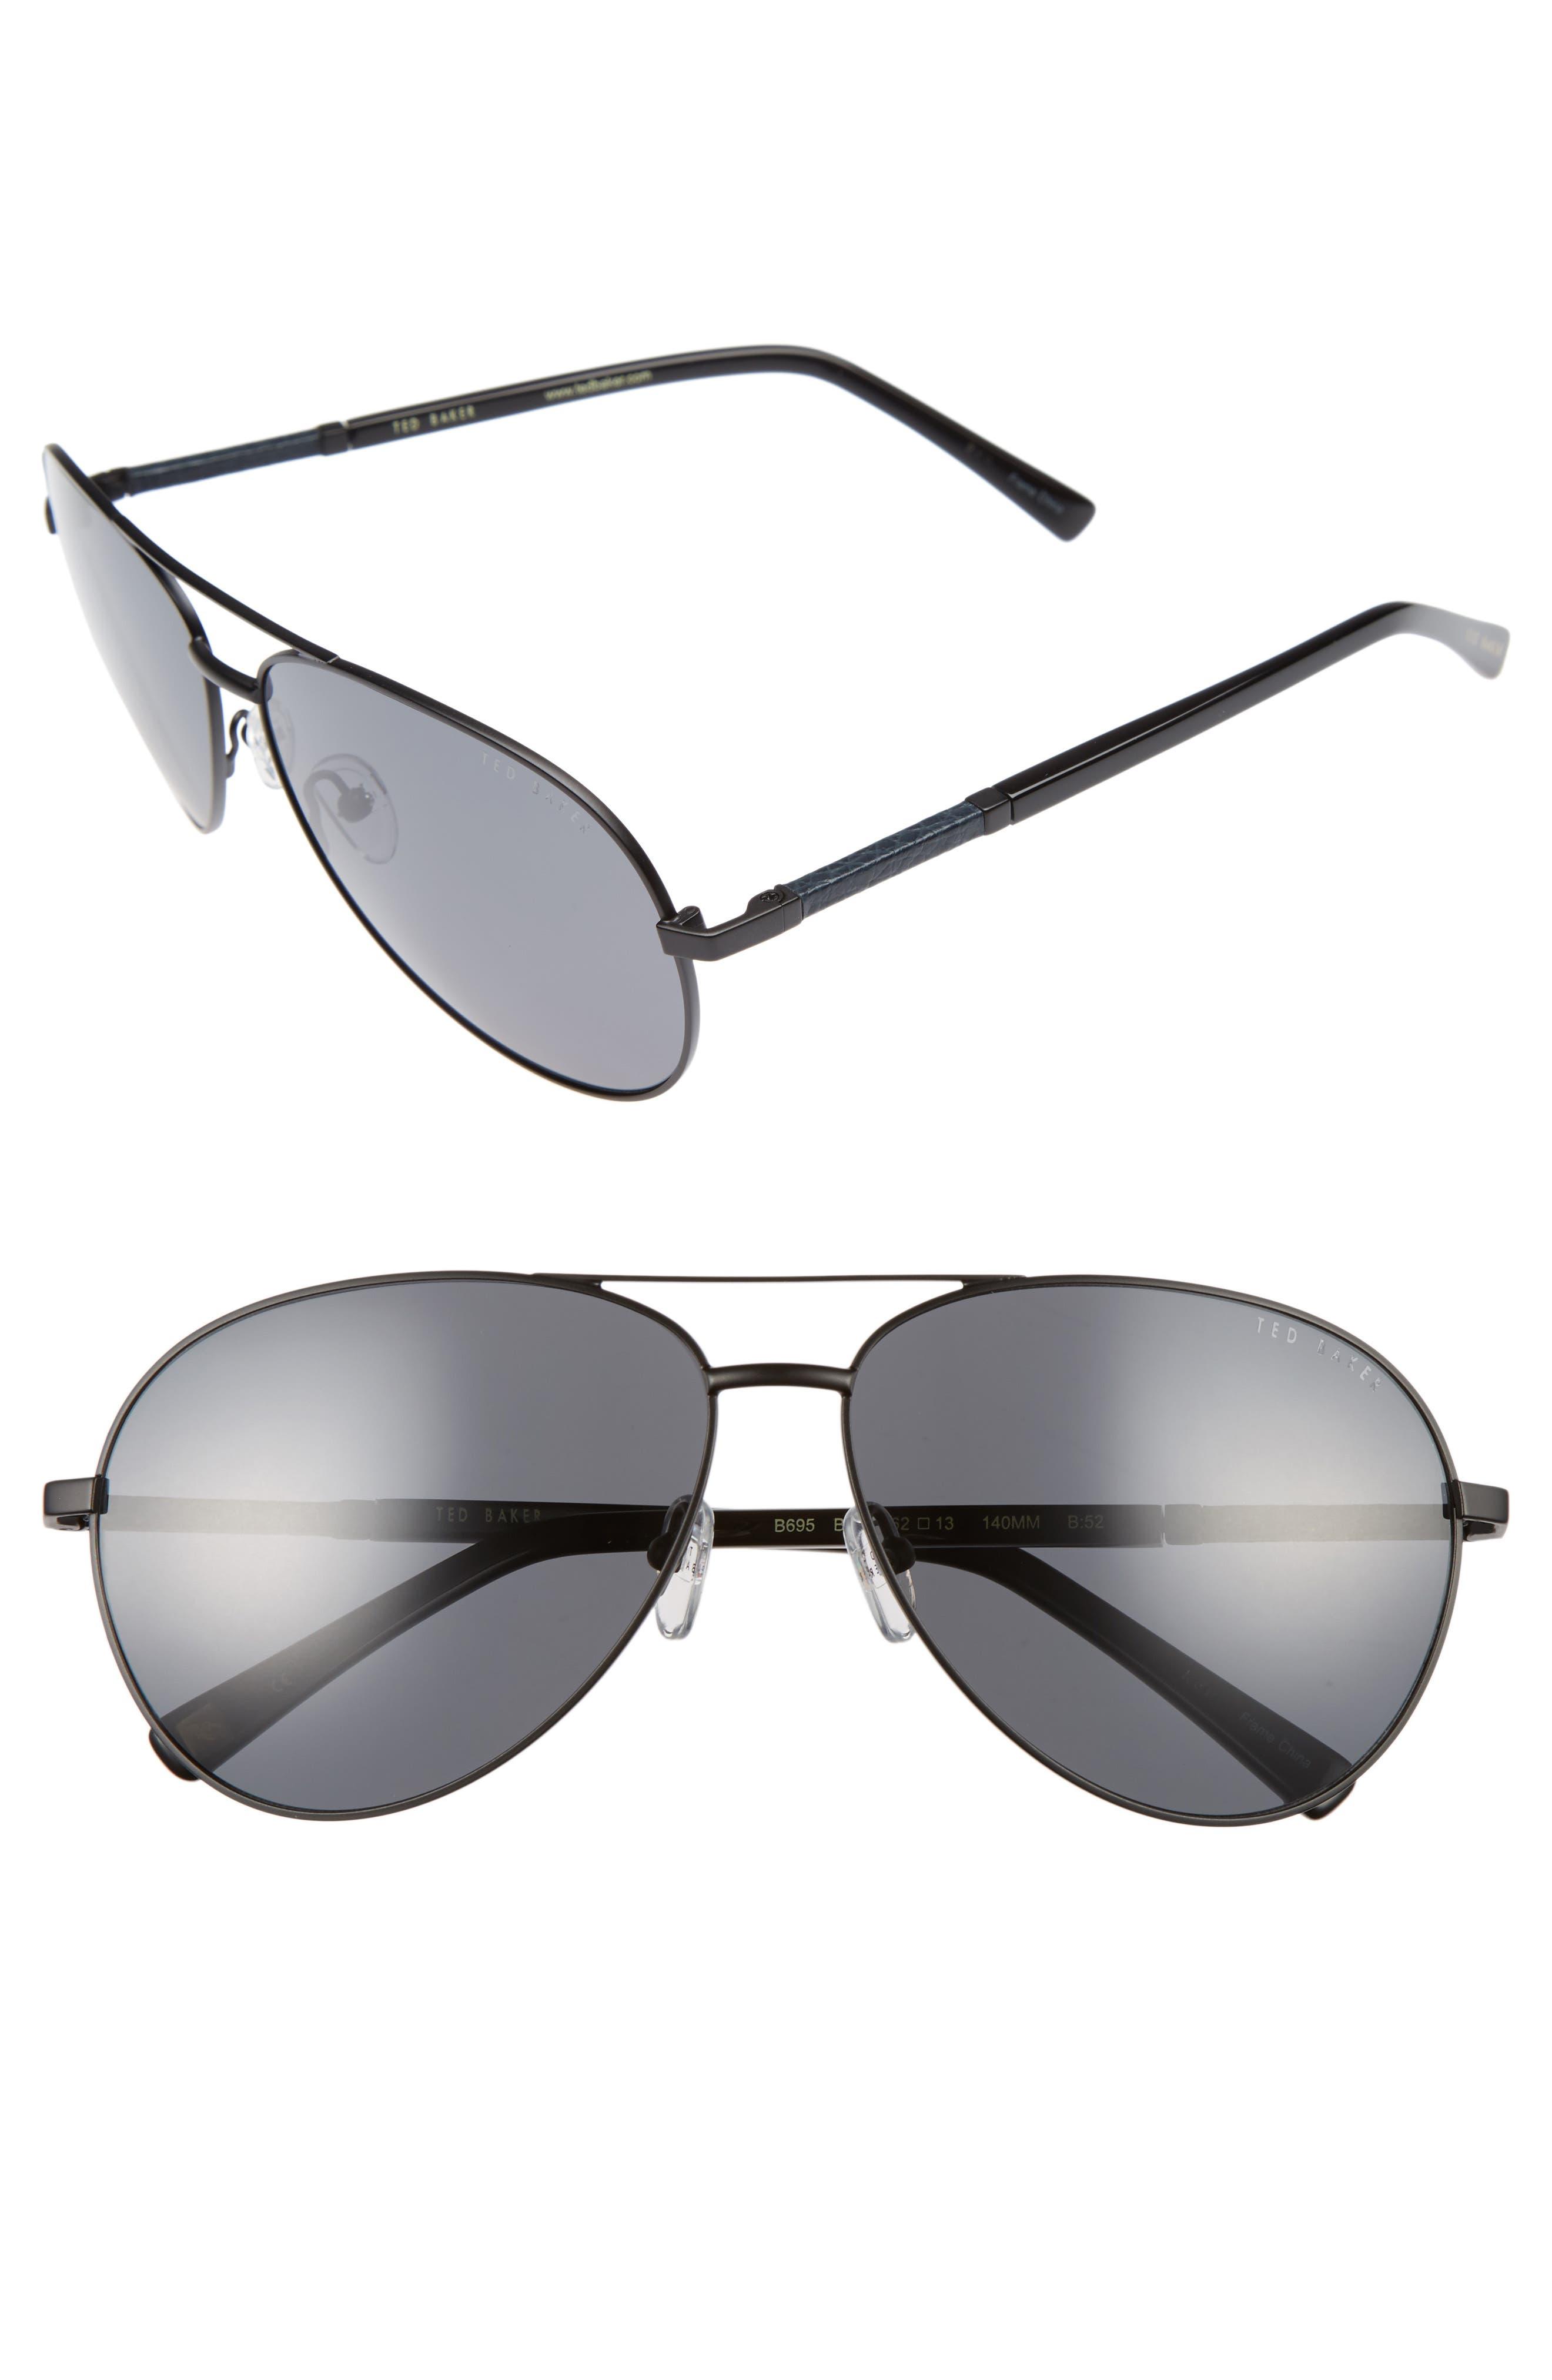 Alternate Image 1 Selected - Ted Baker London 62mm Polarized Aviator Sunglasses